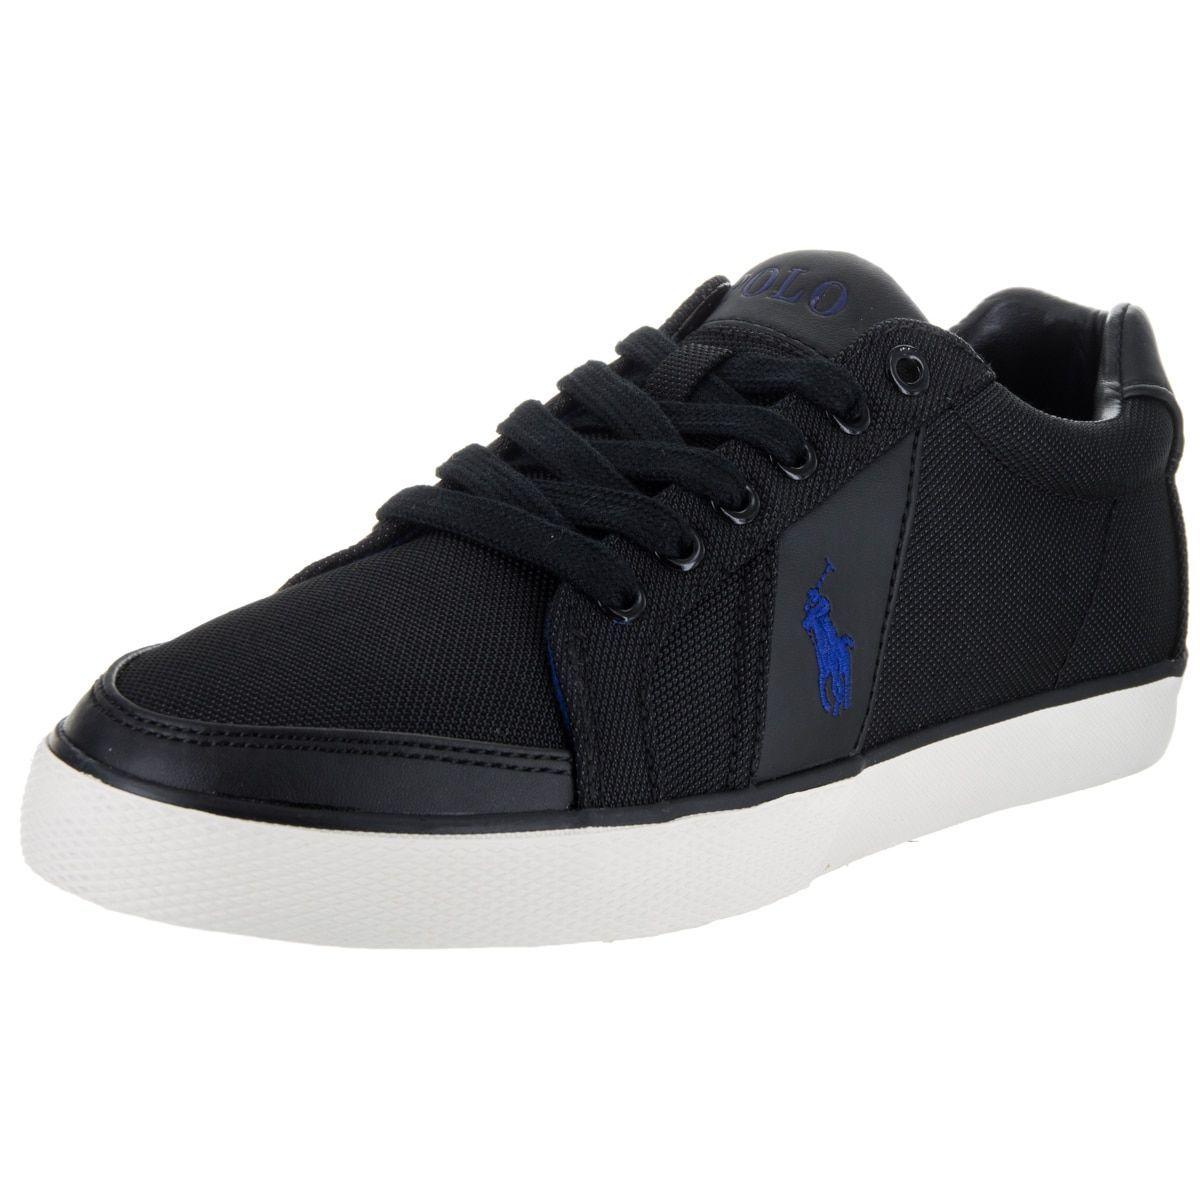 Polo Ralph Lauren Men's Hugh Sk Vlc Casual Shoes